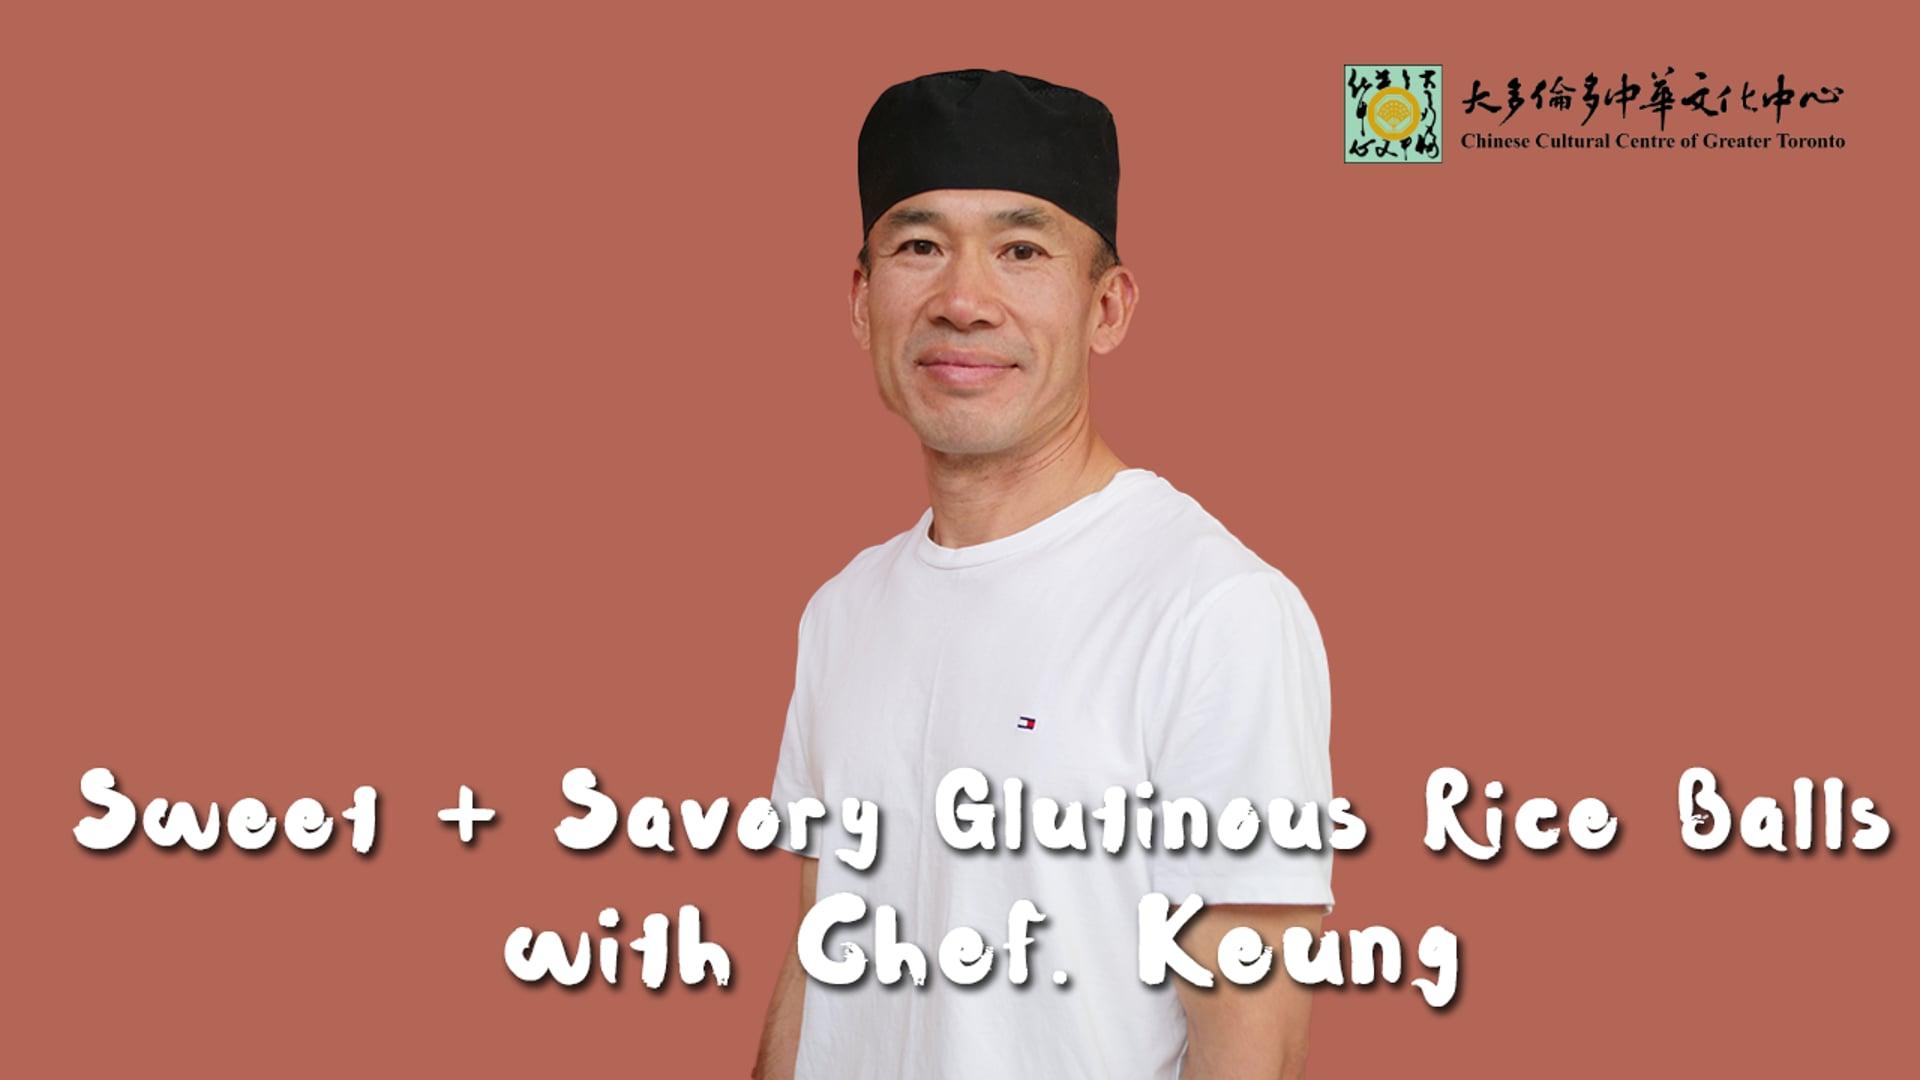 Sweet + Savoury Glutinous Rice Balls - Chef Keung | CCC Connect